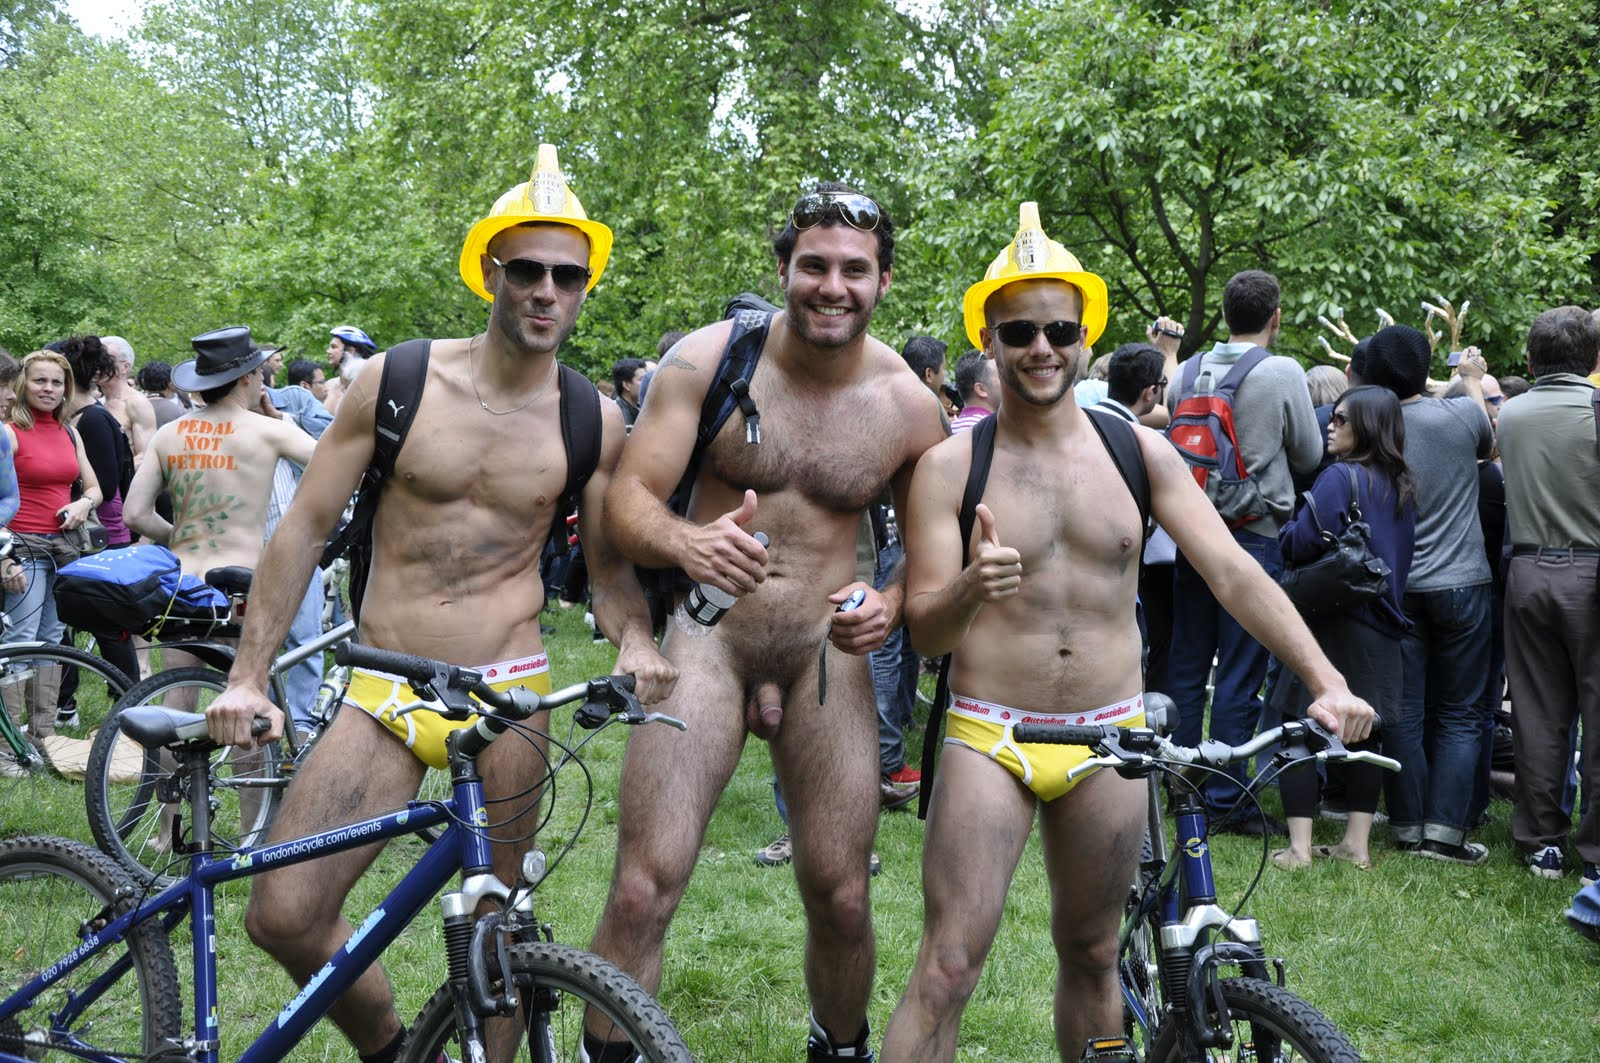 cfnm street bikers World Naked Bike Ride